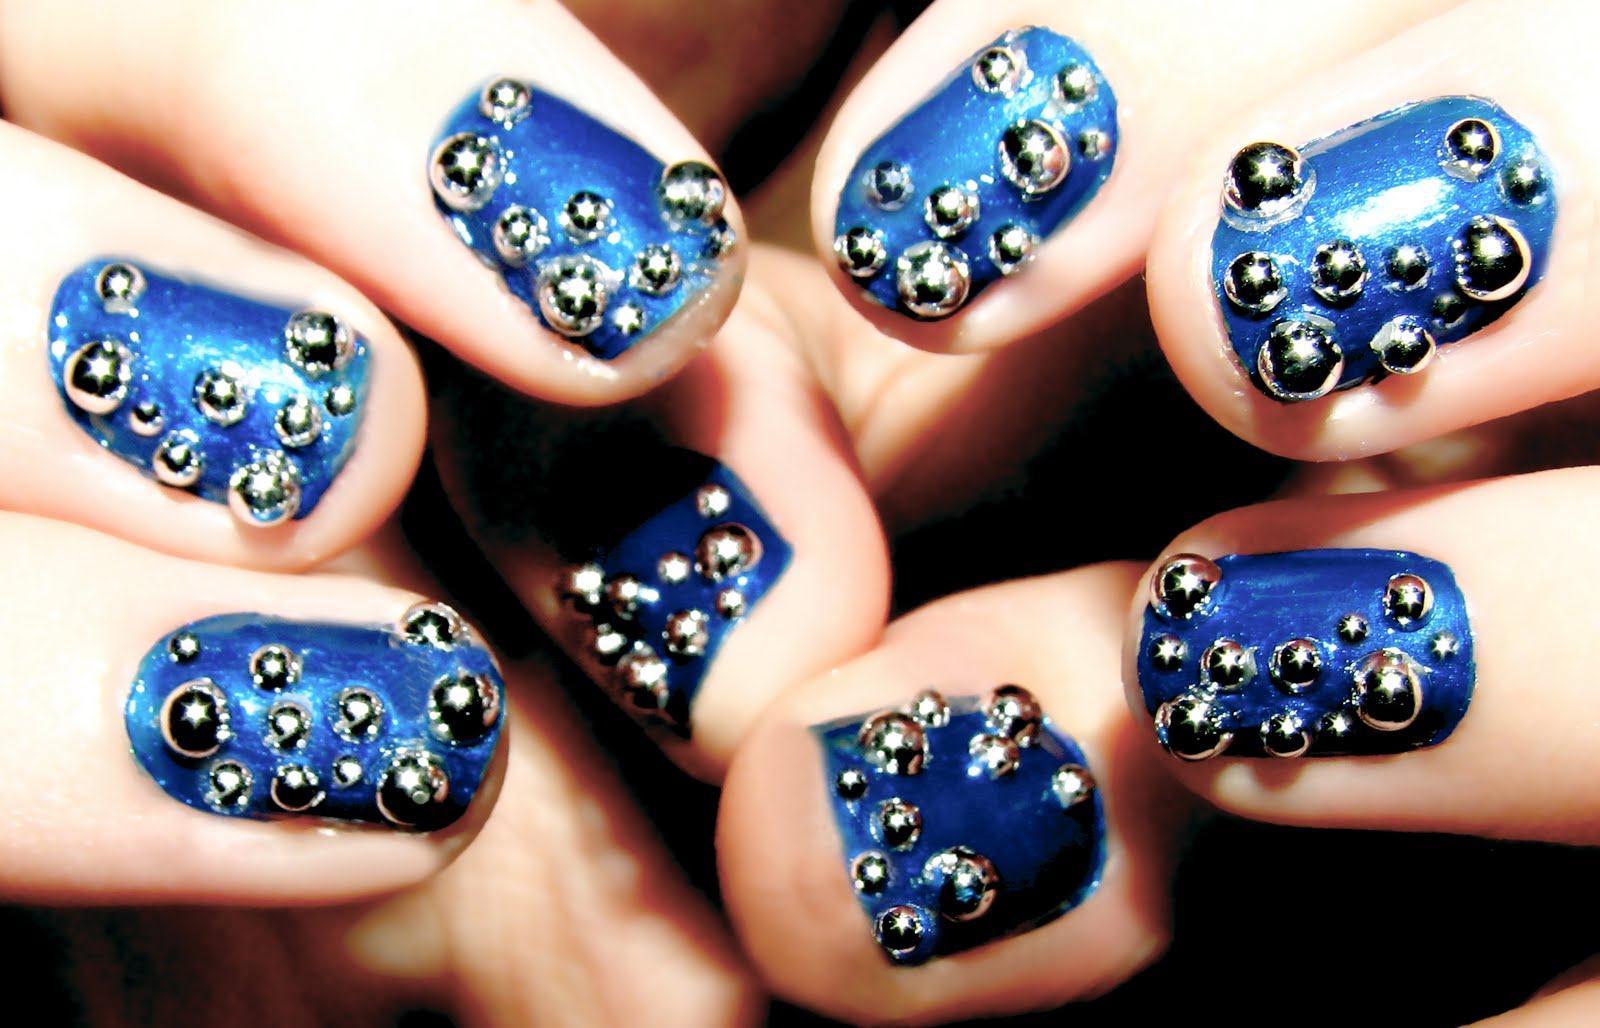 Nails art new look 2013 |Women Fas